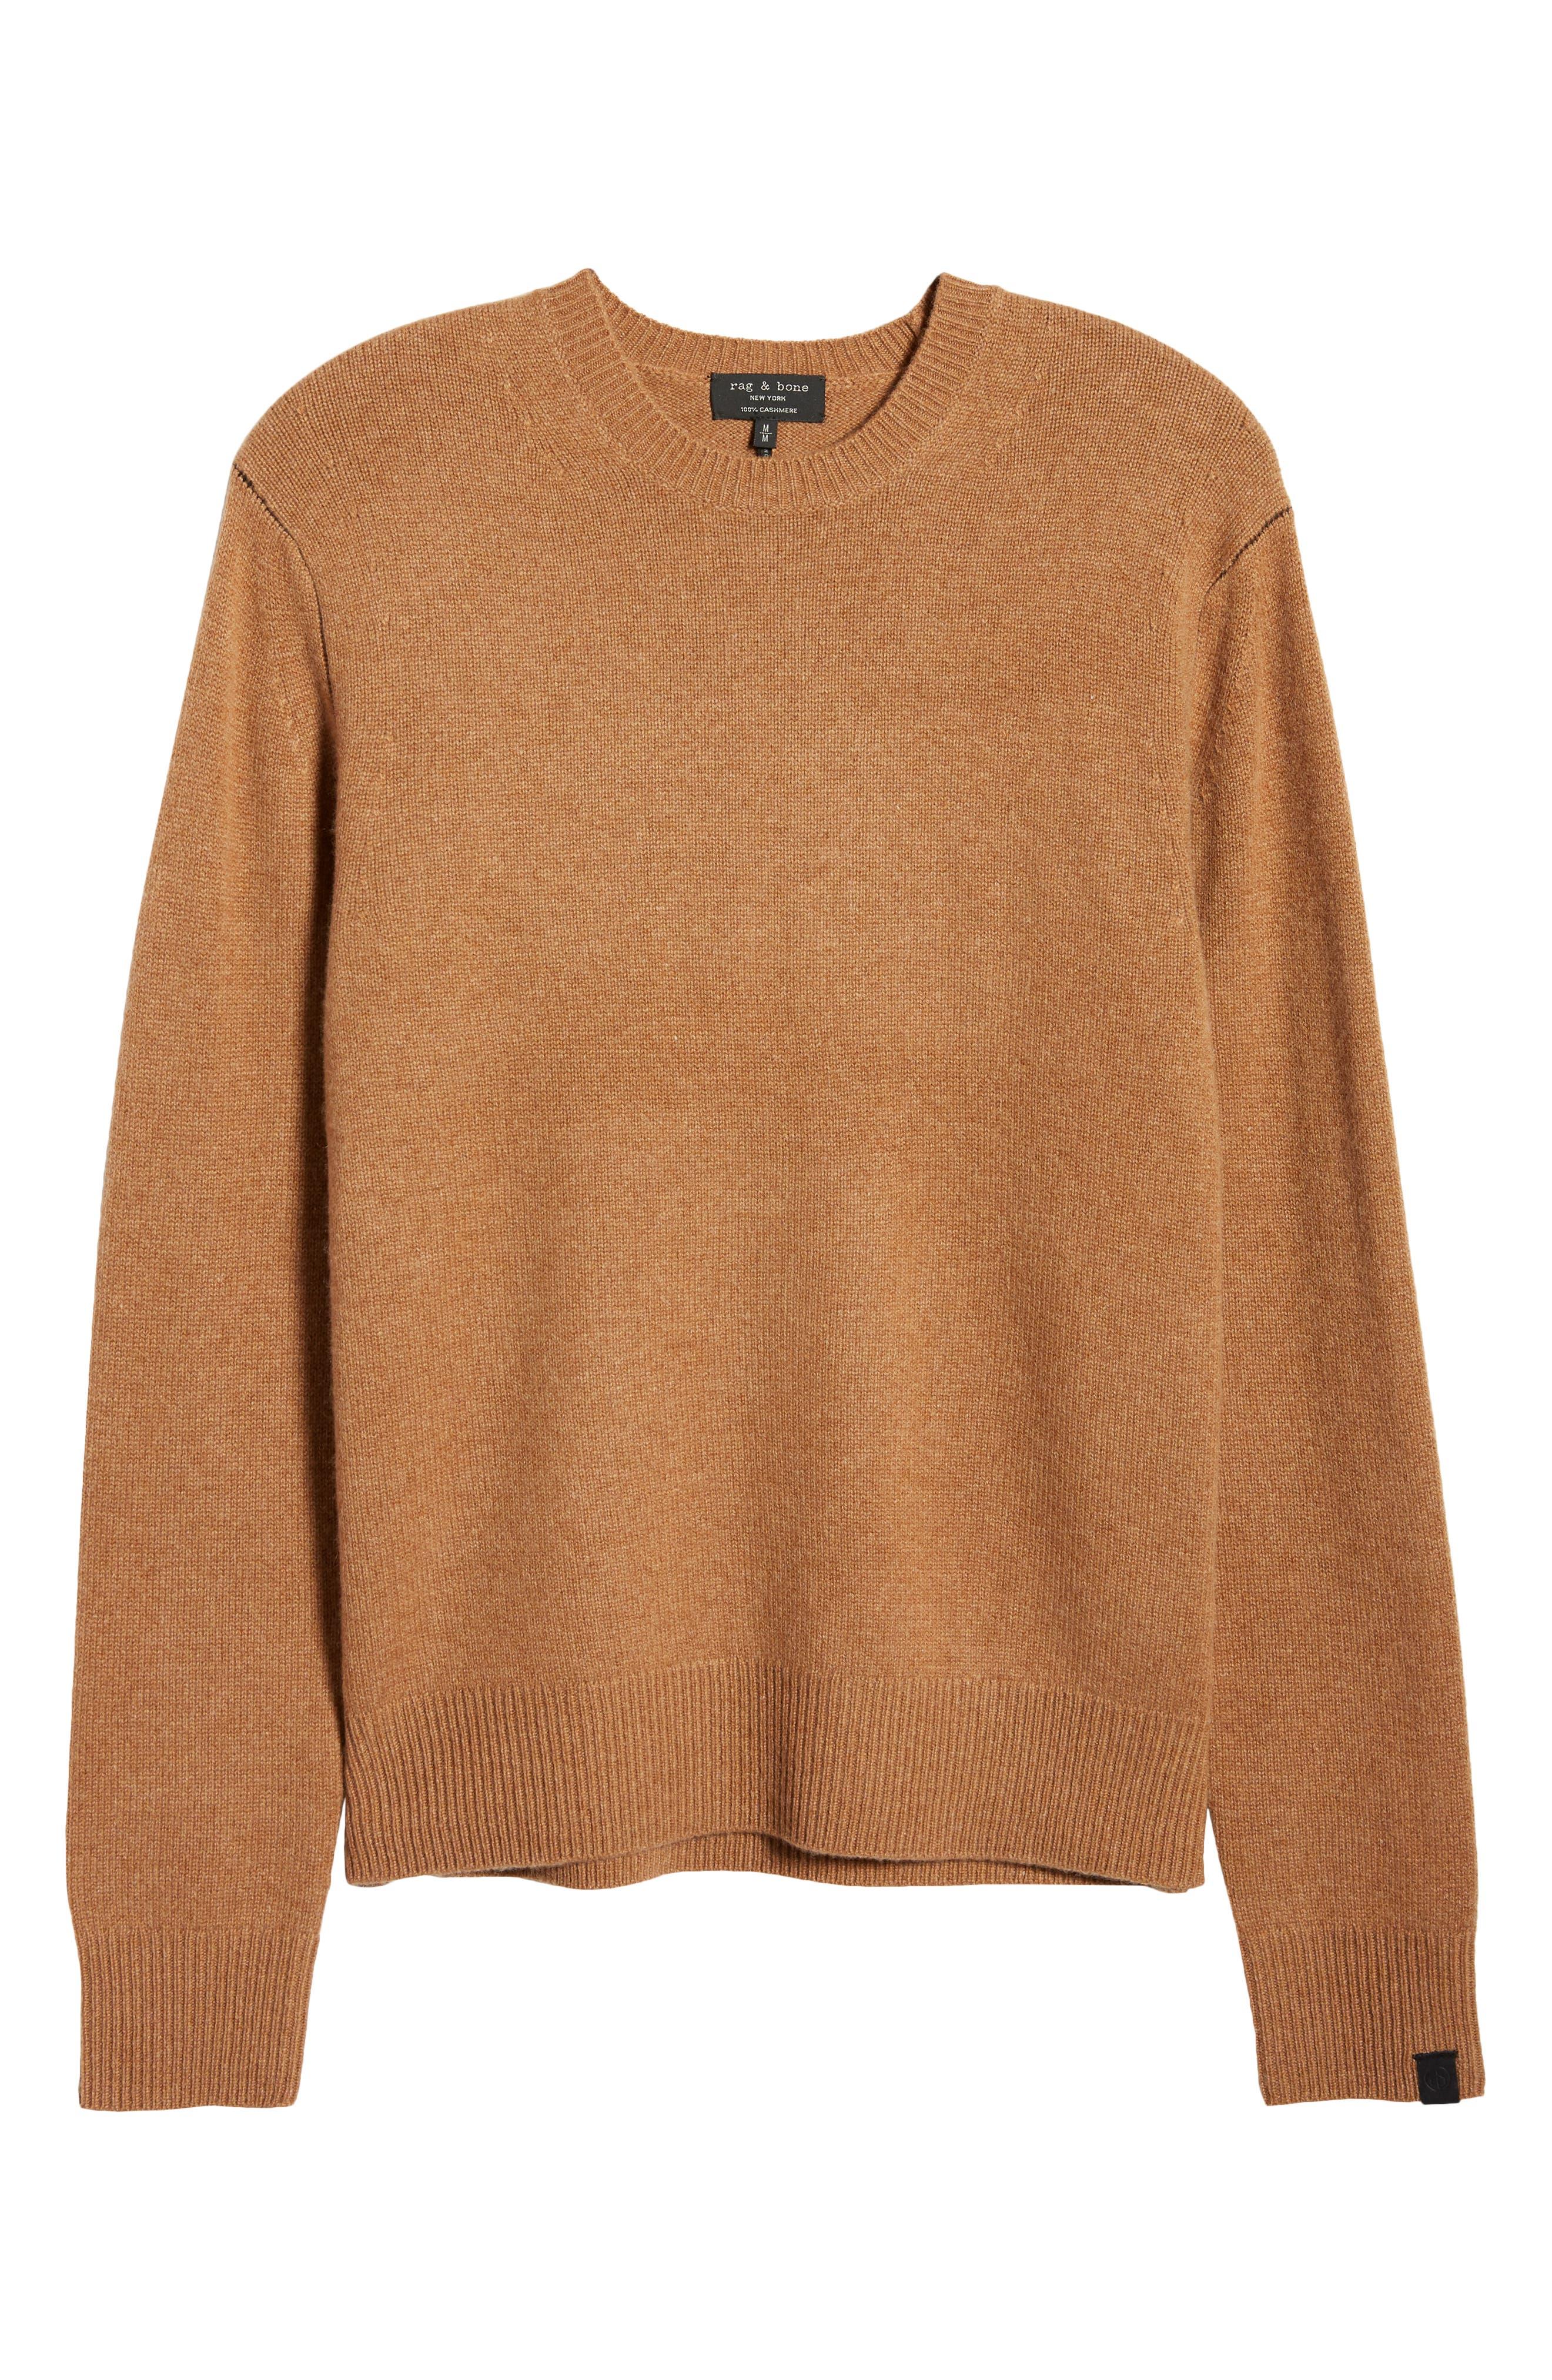 Rag /& Bone Men's Army Cotton Wool Double Knit Crew-Neck Long Sleeve T-Shirt $225